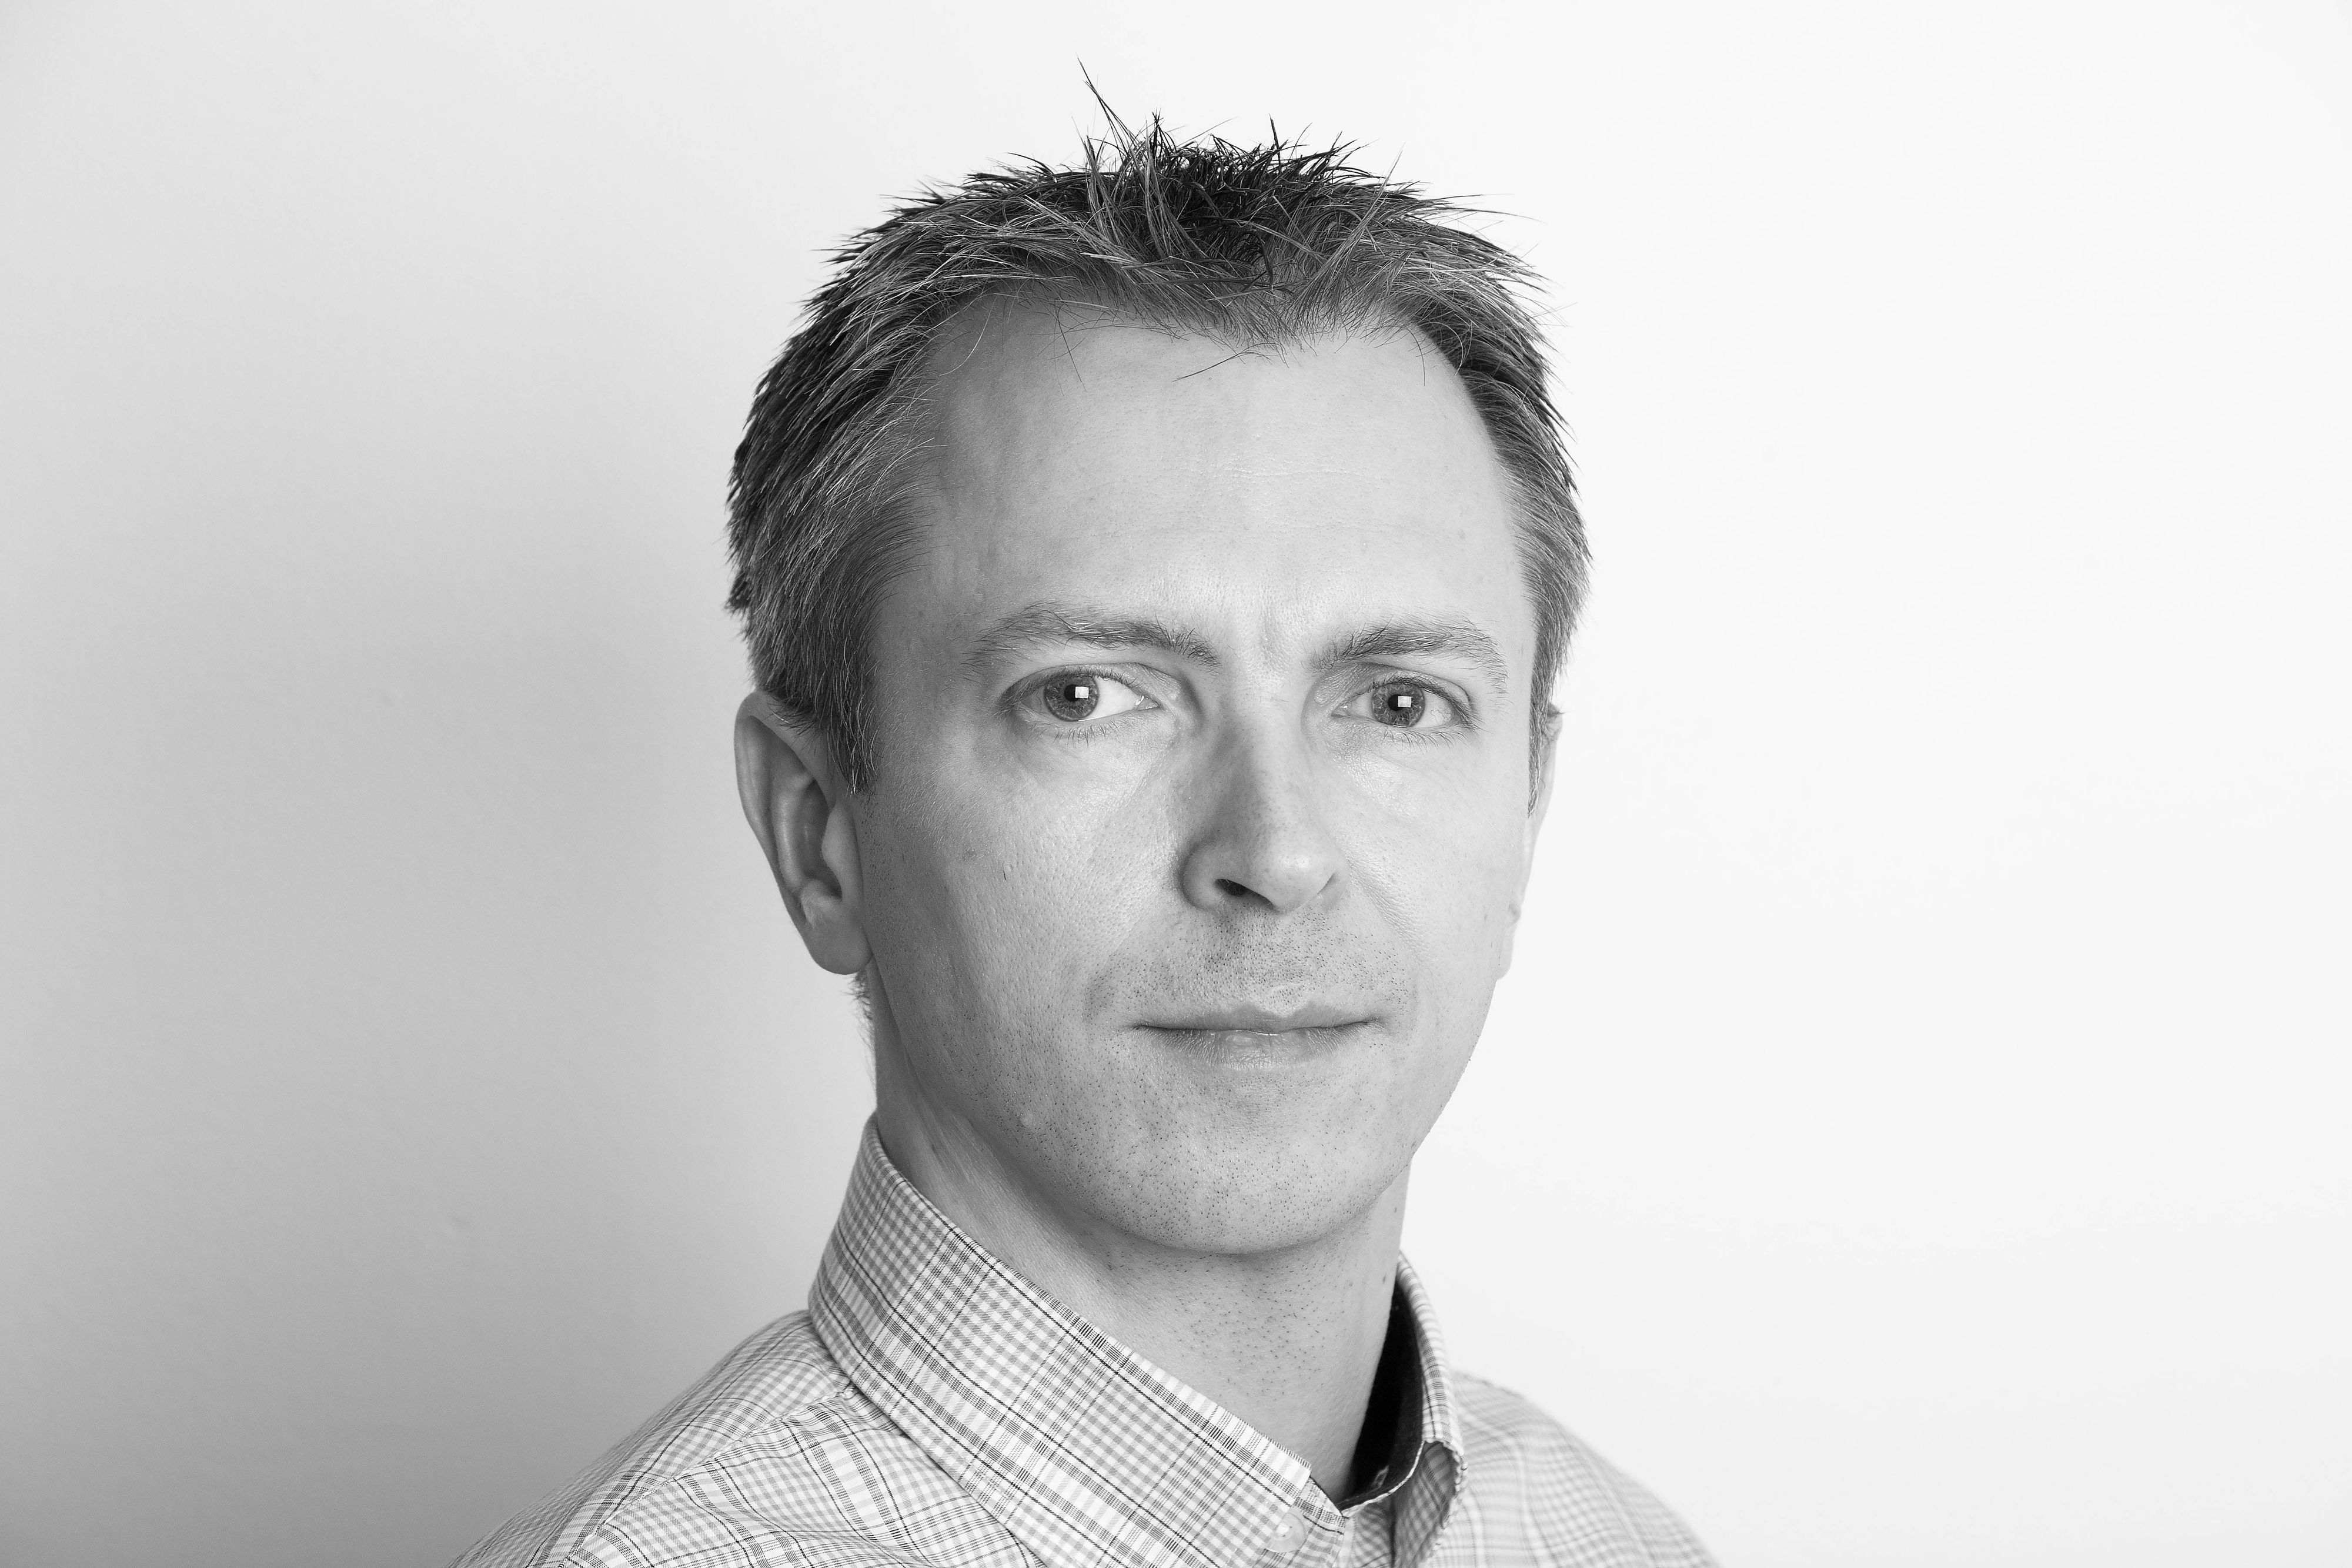 Kurt Lekanger, fagredaktør i Tek.no.Foto: Tek.no